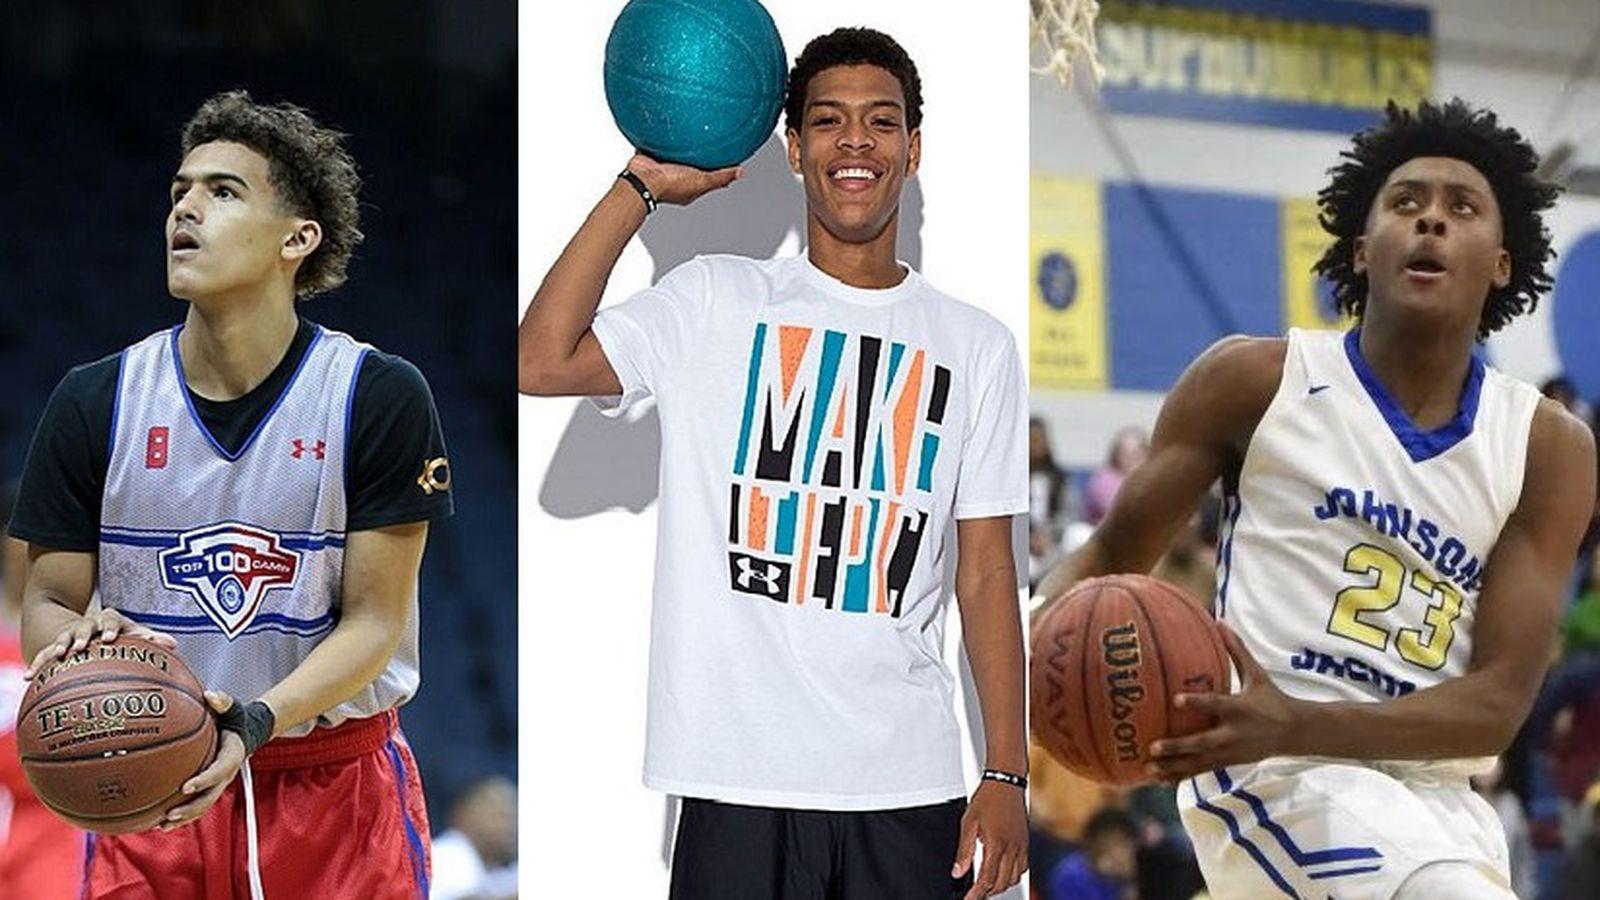 2013 Recruits Uk Basketball And Football Recruiting News: Kentucky Basketball Recruiting '8 Or 9' In 2017; We Guess